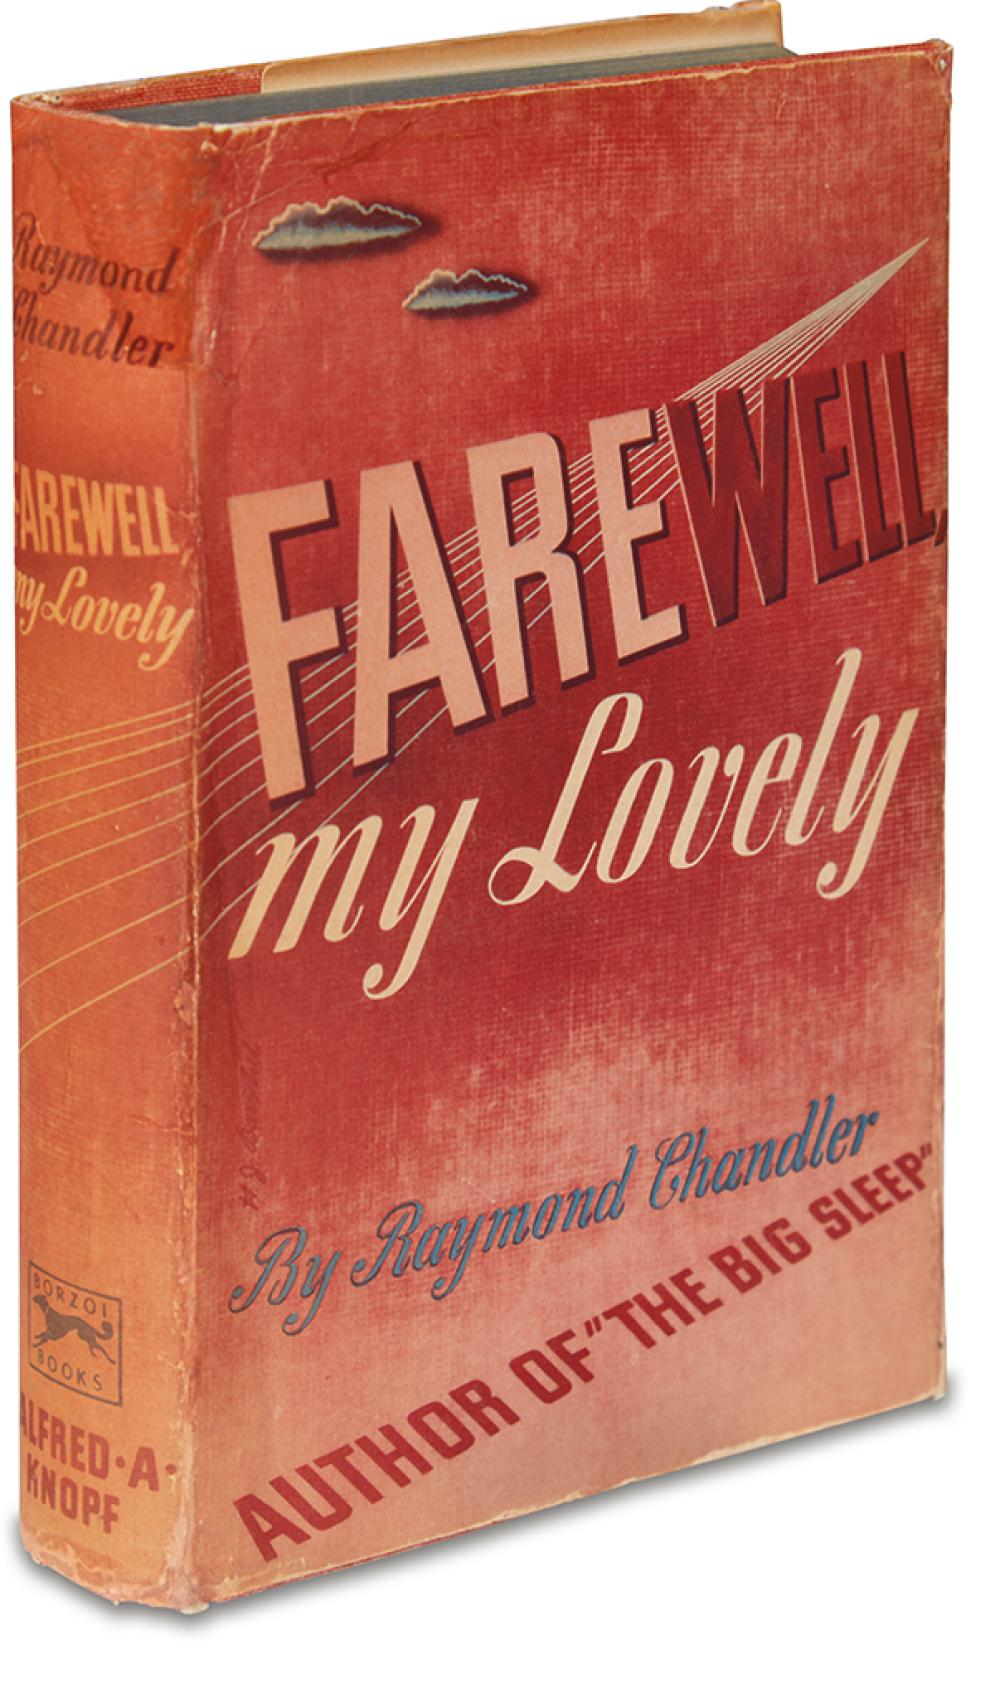 CHANDLER, RAYMOND. Farewell, My Lovely.